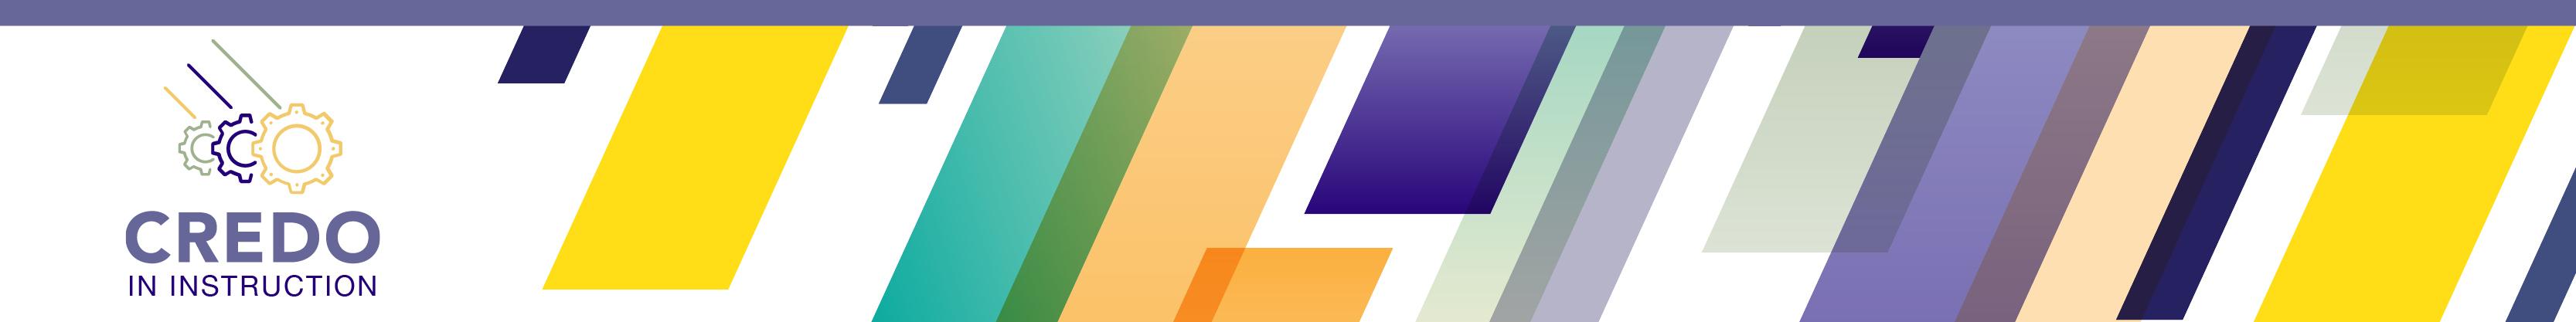 CredoInInstrction_LandingPageHeader_1600x200 v2 (1)